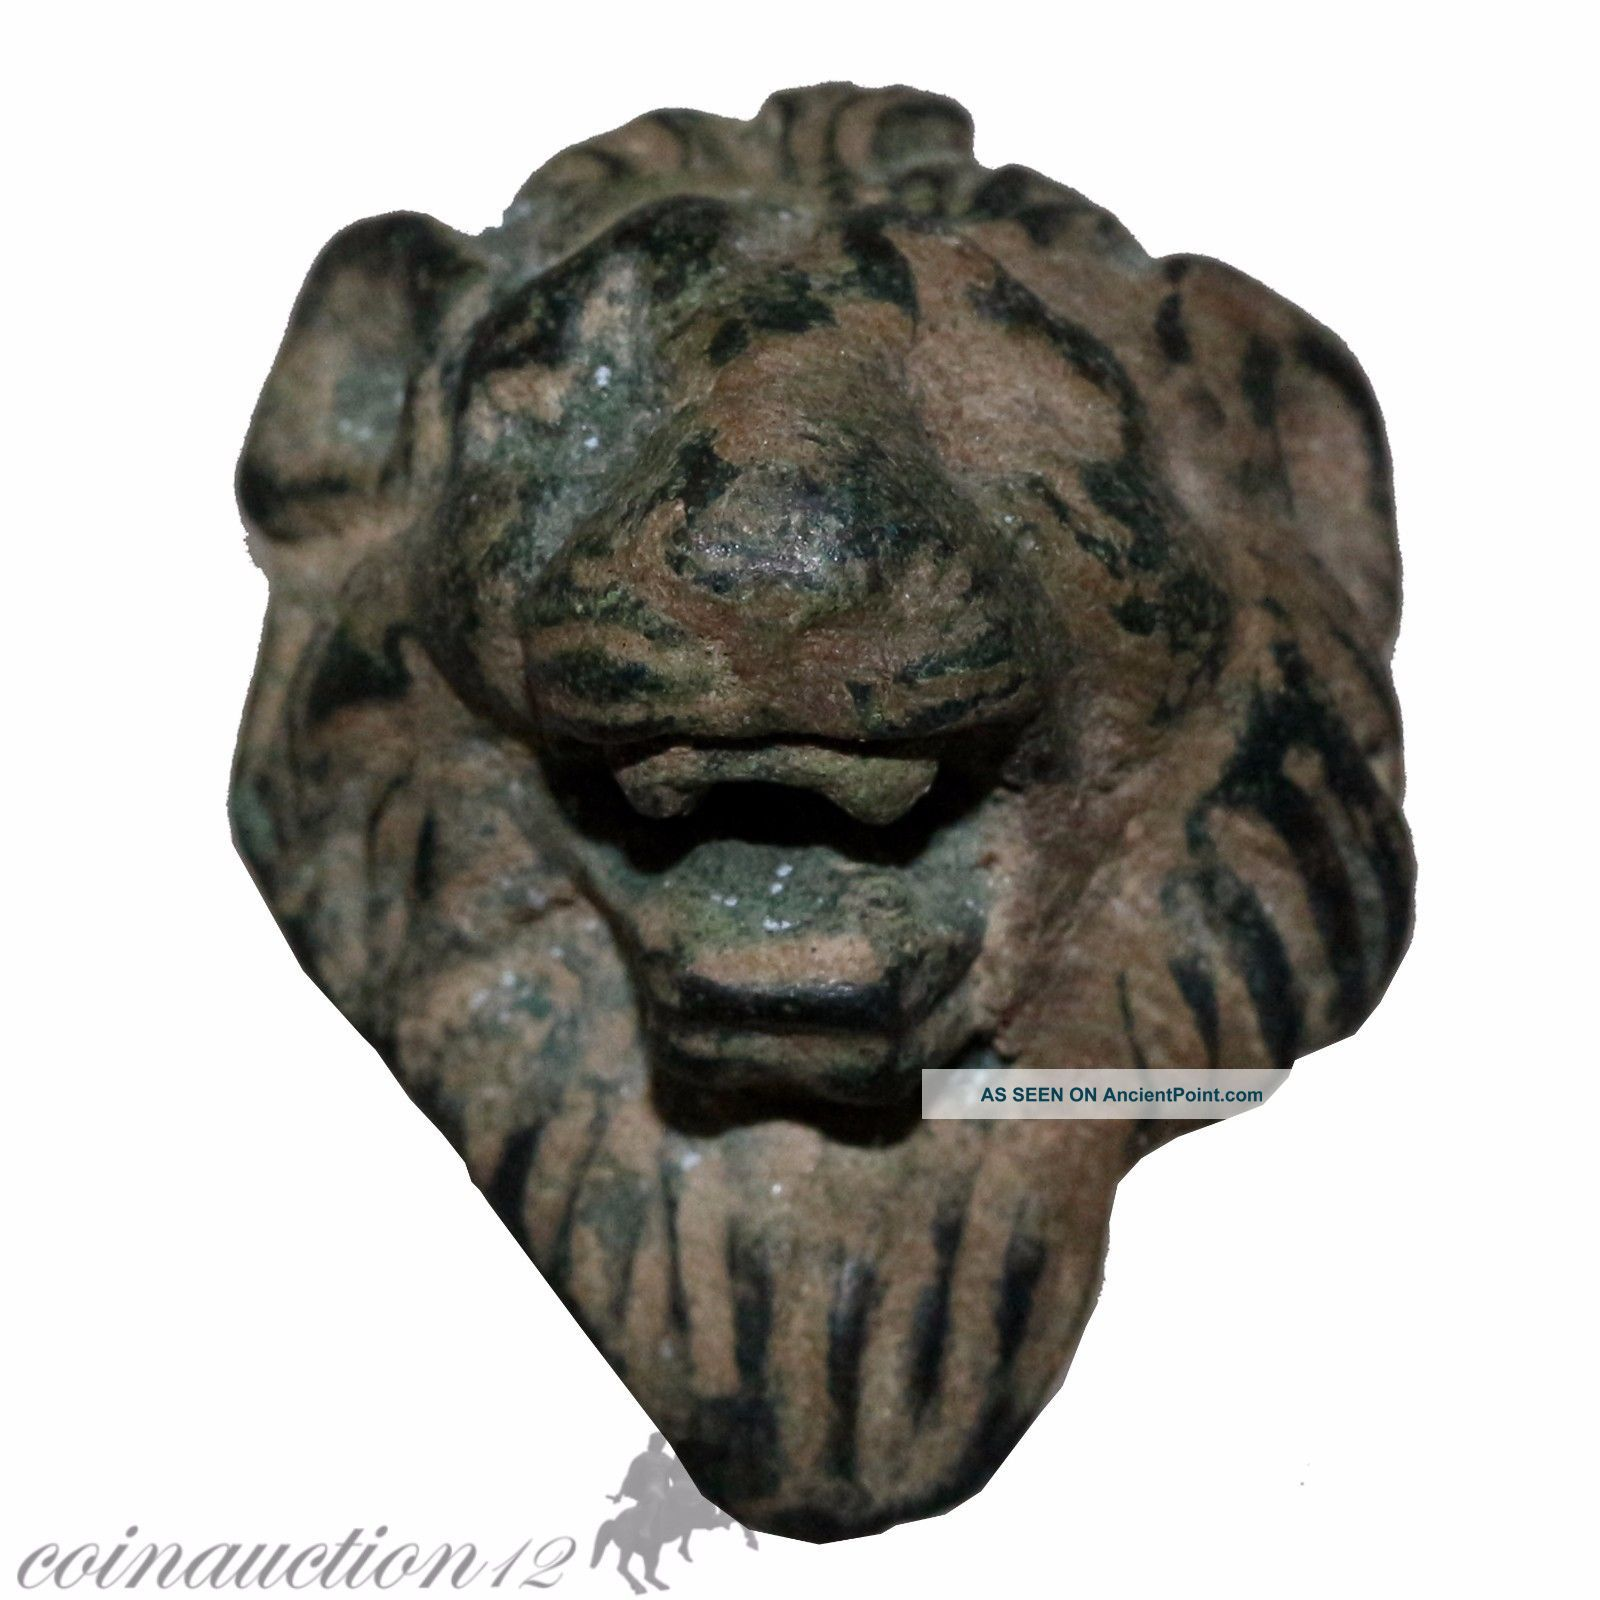 Intact Roman Legionary Bronze Lion Mount Applique Decoration Circa 200 - 300 Ad Roman photo